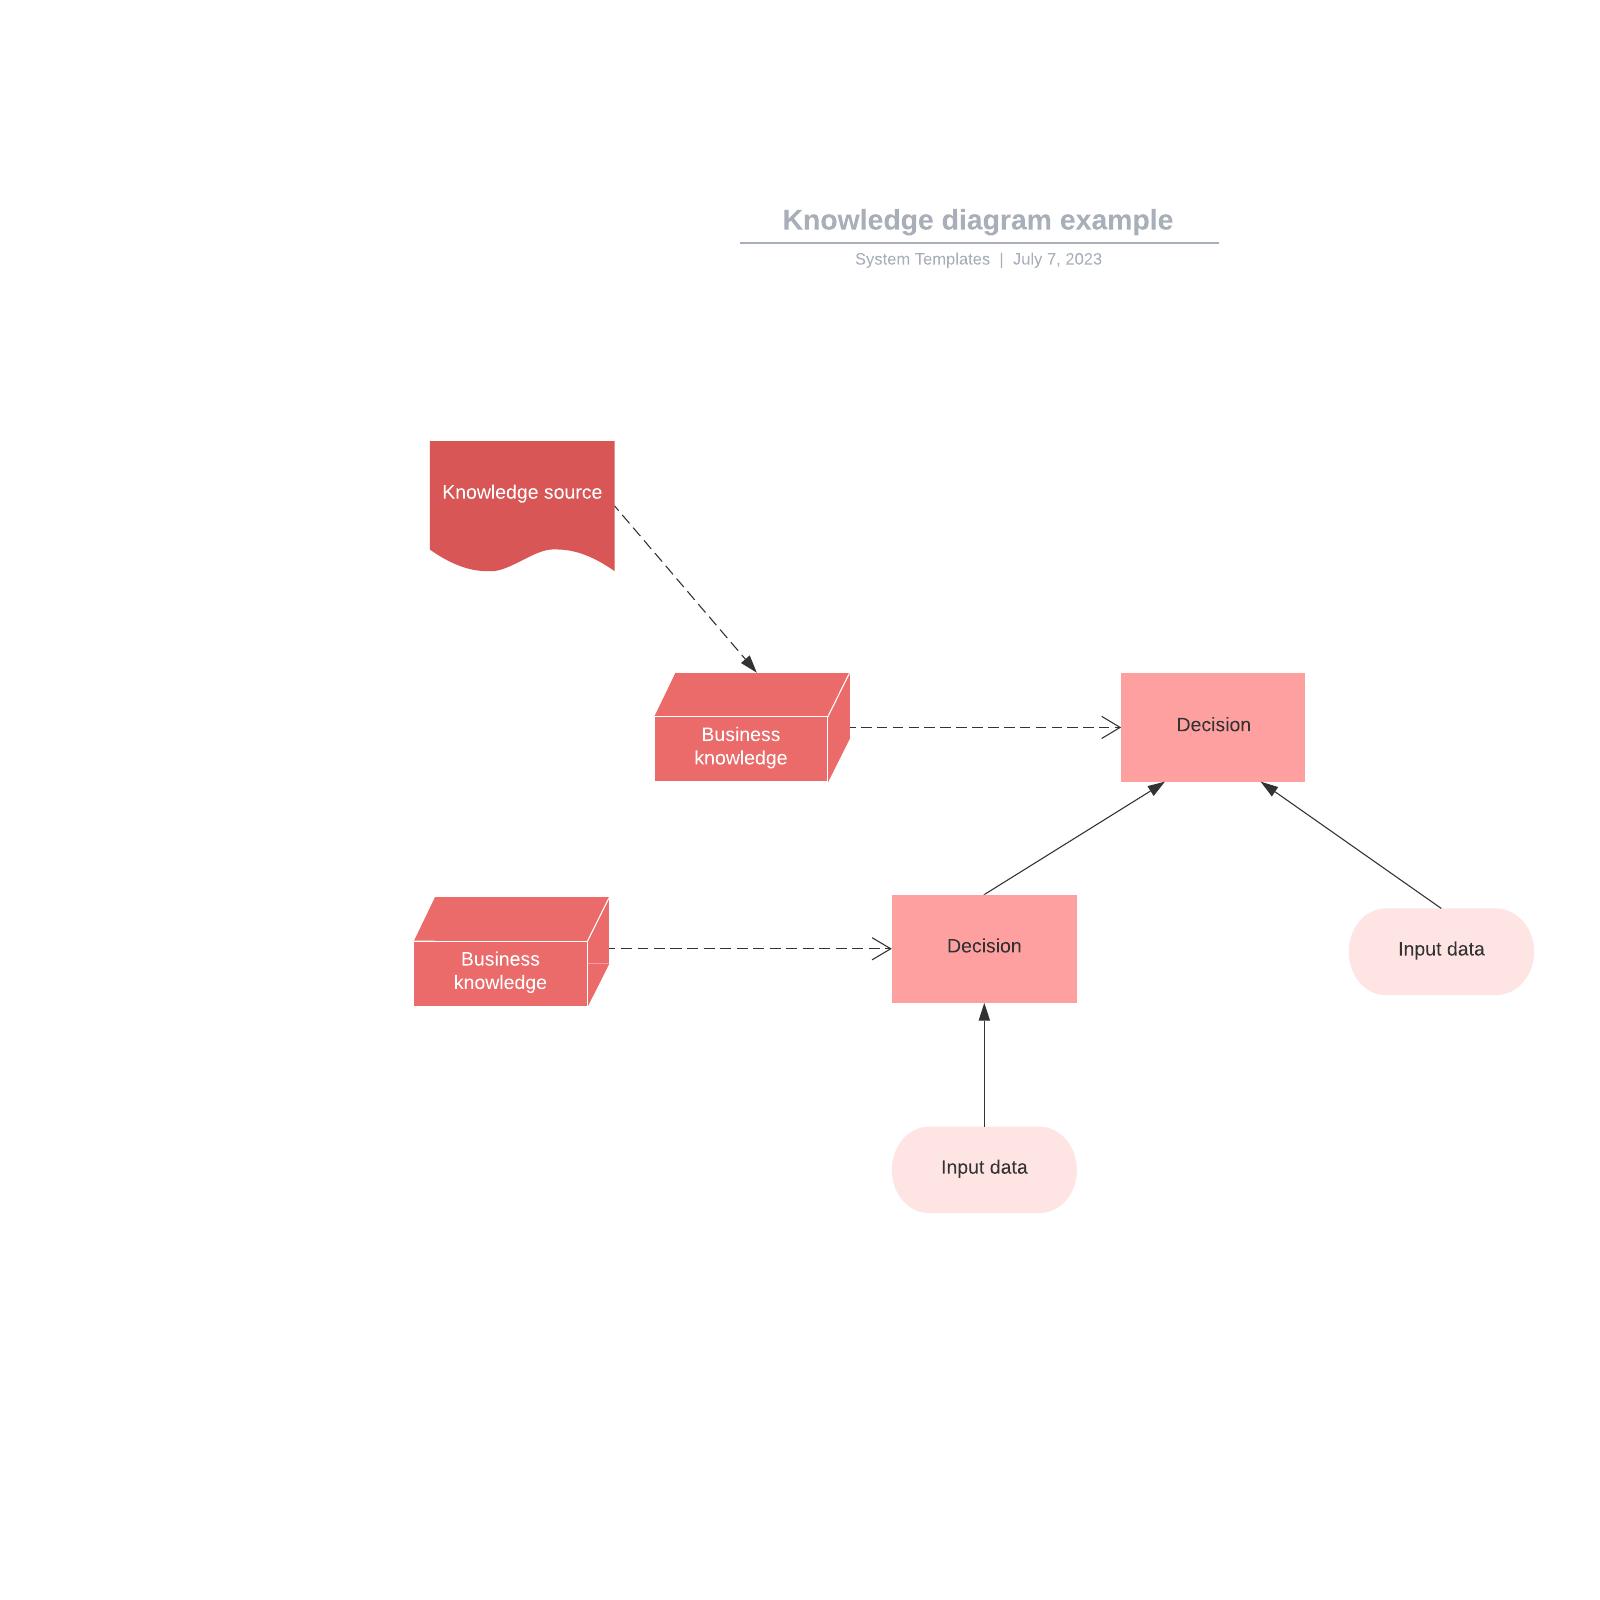 Knowledge diagram example